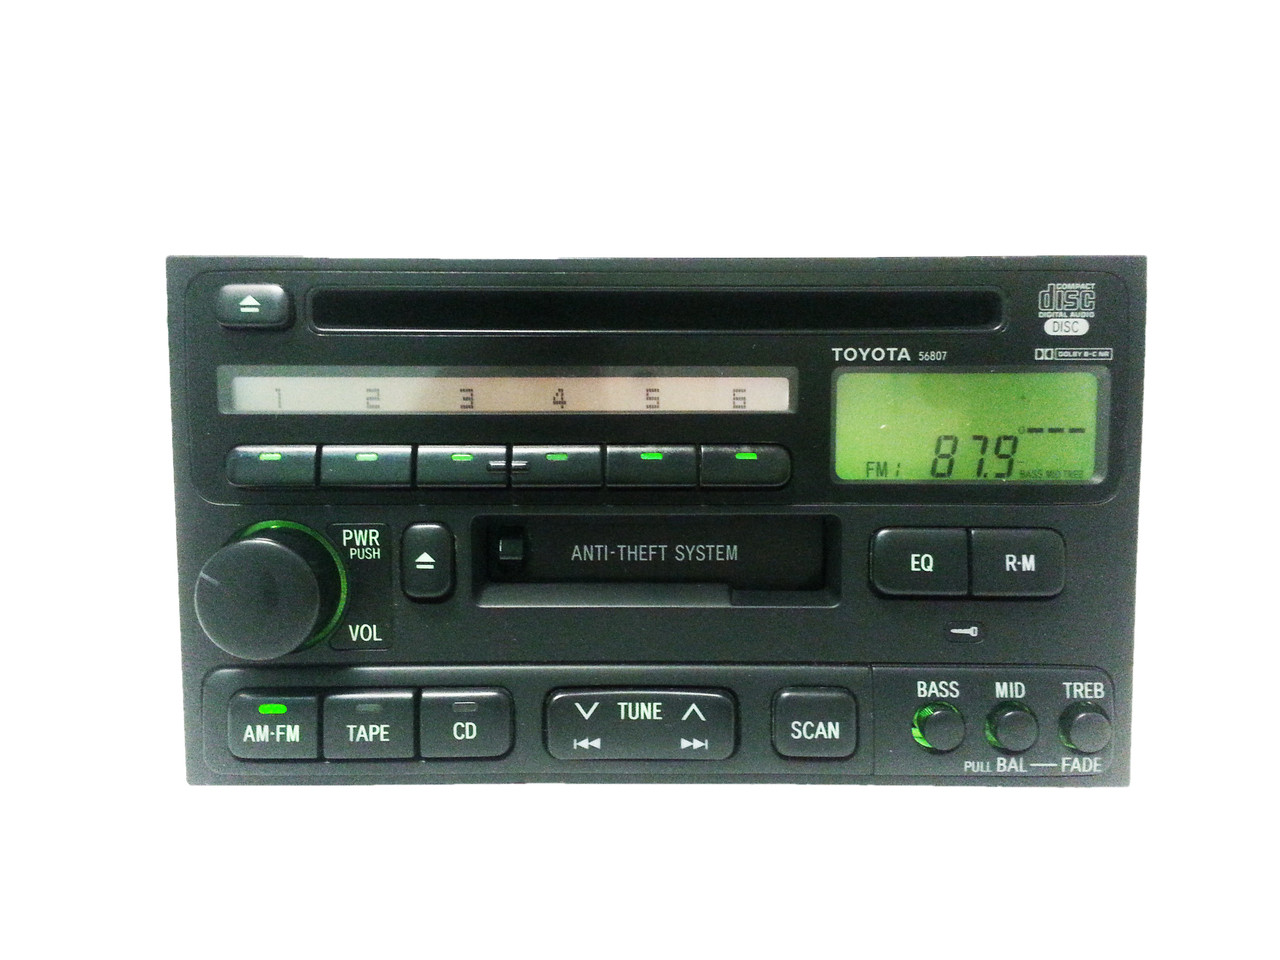 toyota factory oem radio tape and cd player 4runner avalon camry celica land cruiser solara sienna 56807 86120 33040 1990 1991 1992 1993 1994 1995 1996  [ 1280 x 960 Pixel ]